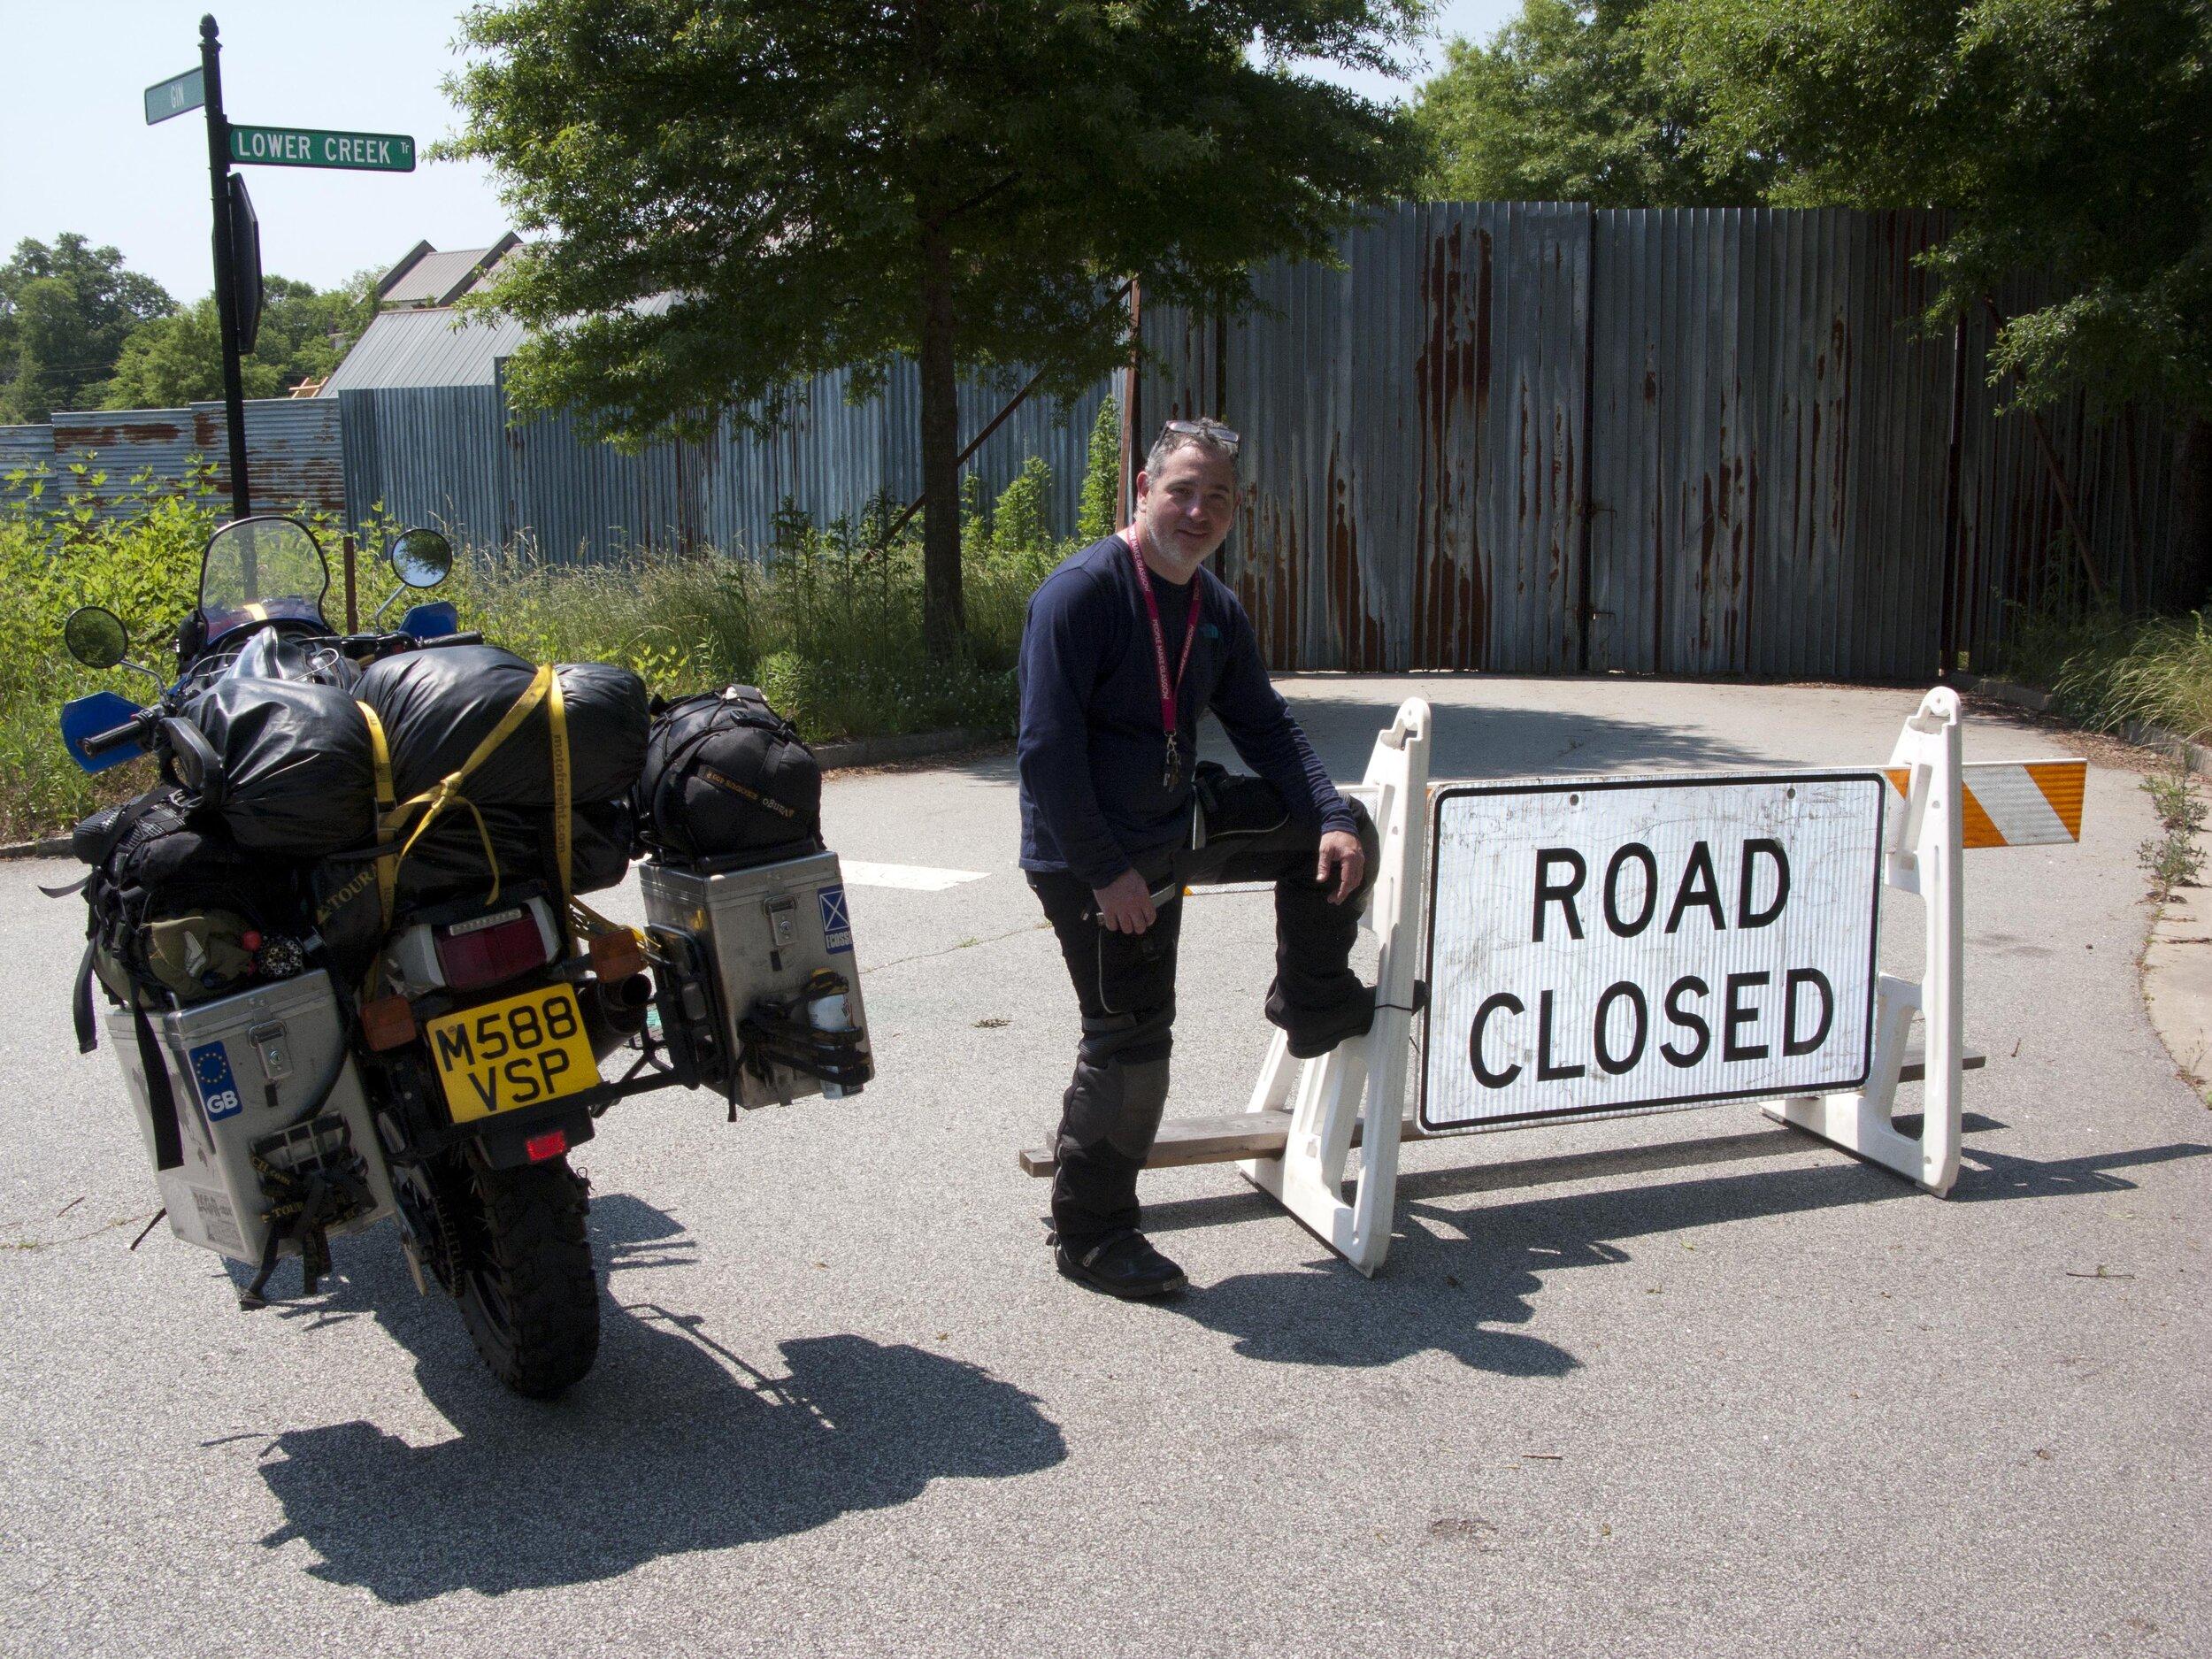 Walking-Dead-Set-Maurice-McDonald-Adventure-Rider-Radio-Motorcycle-Podcast.JPG